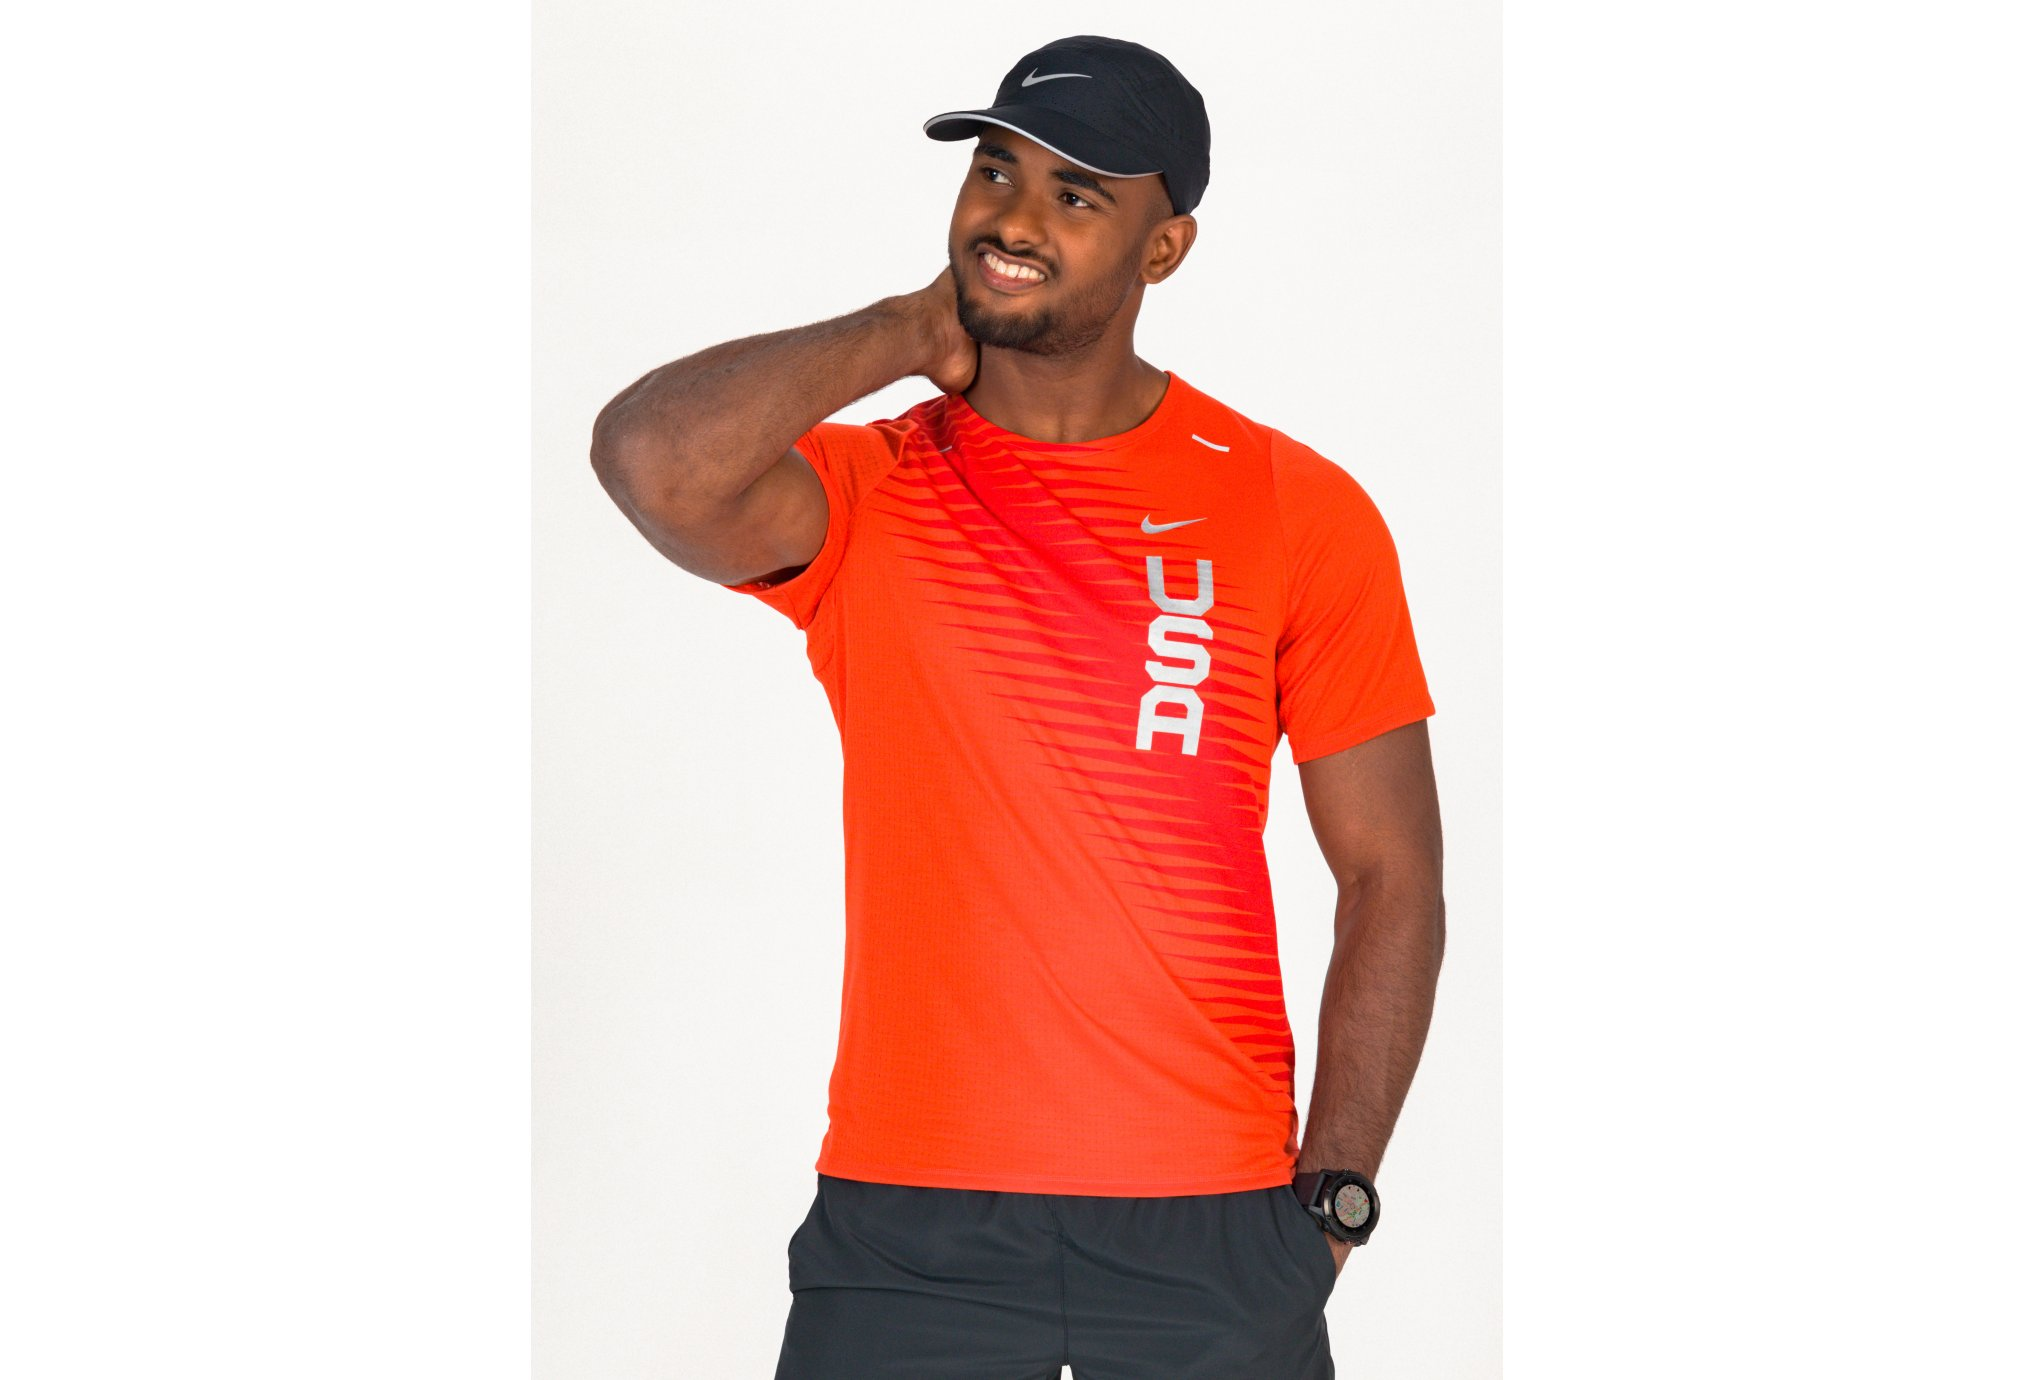 Nike Breathe Rise 365 Team USA M vêtement running homme